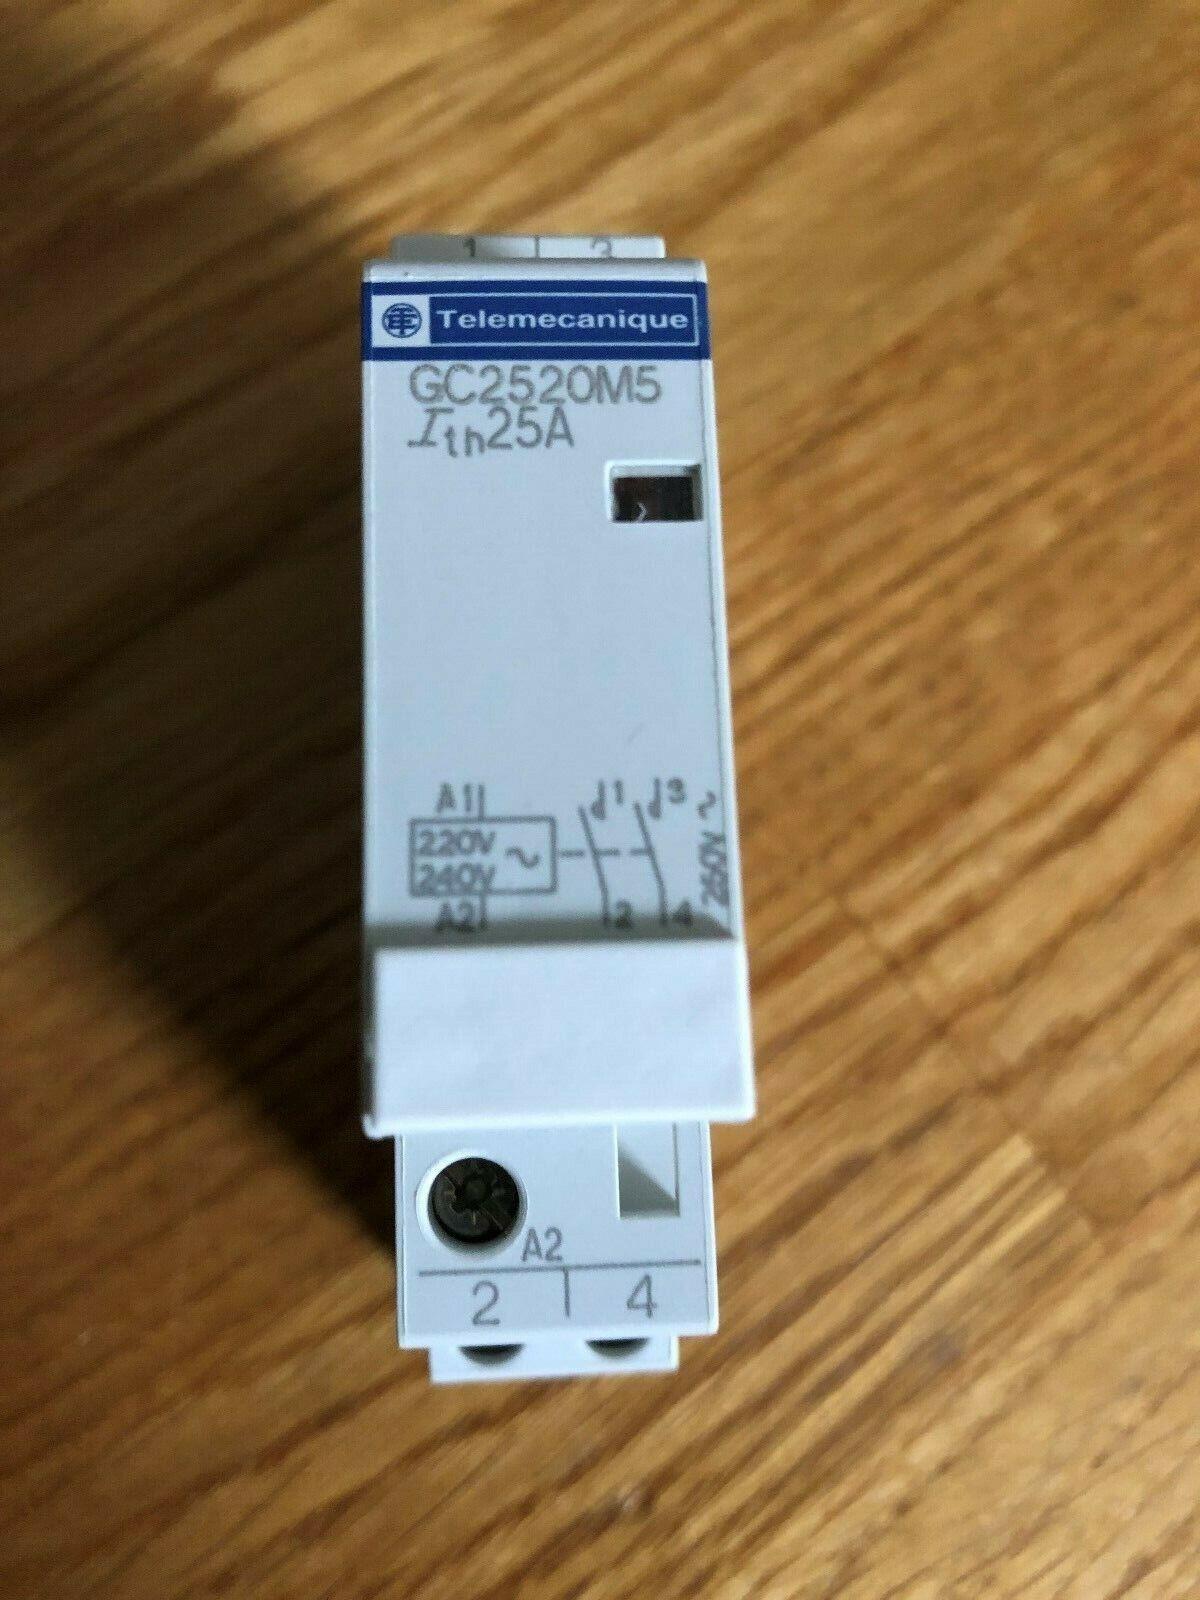 Schneider Electric Modular Contactors GC2520M5